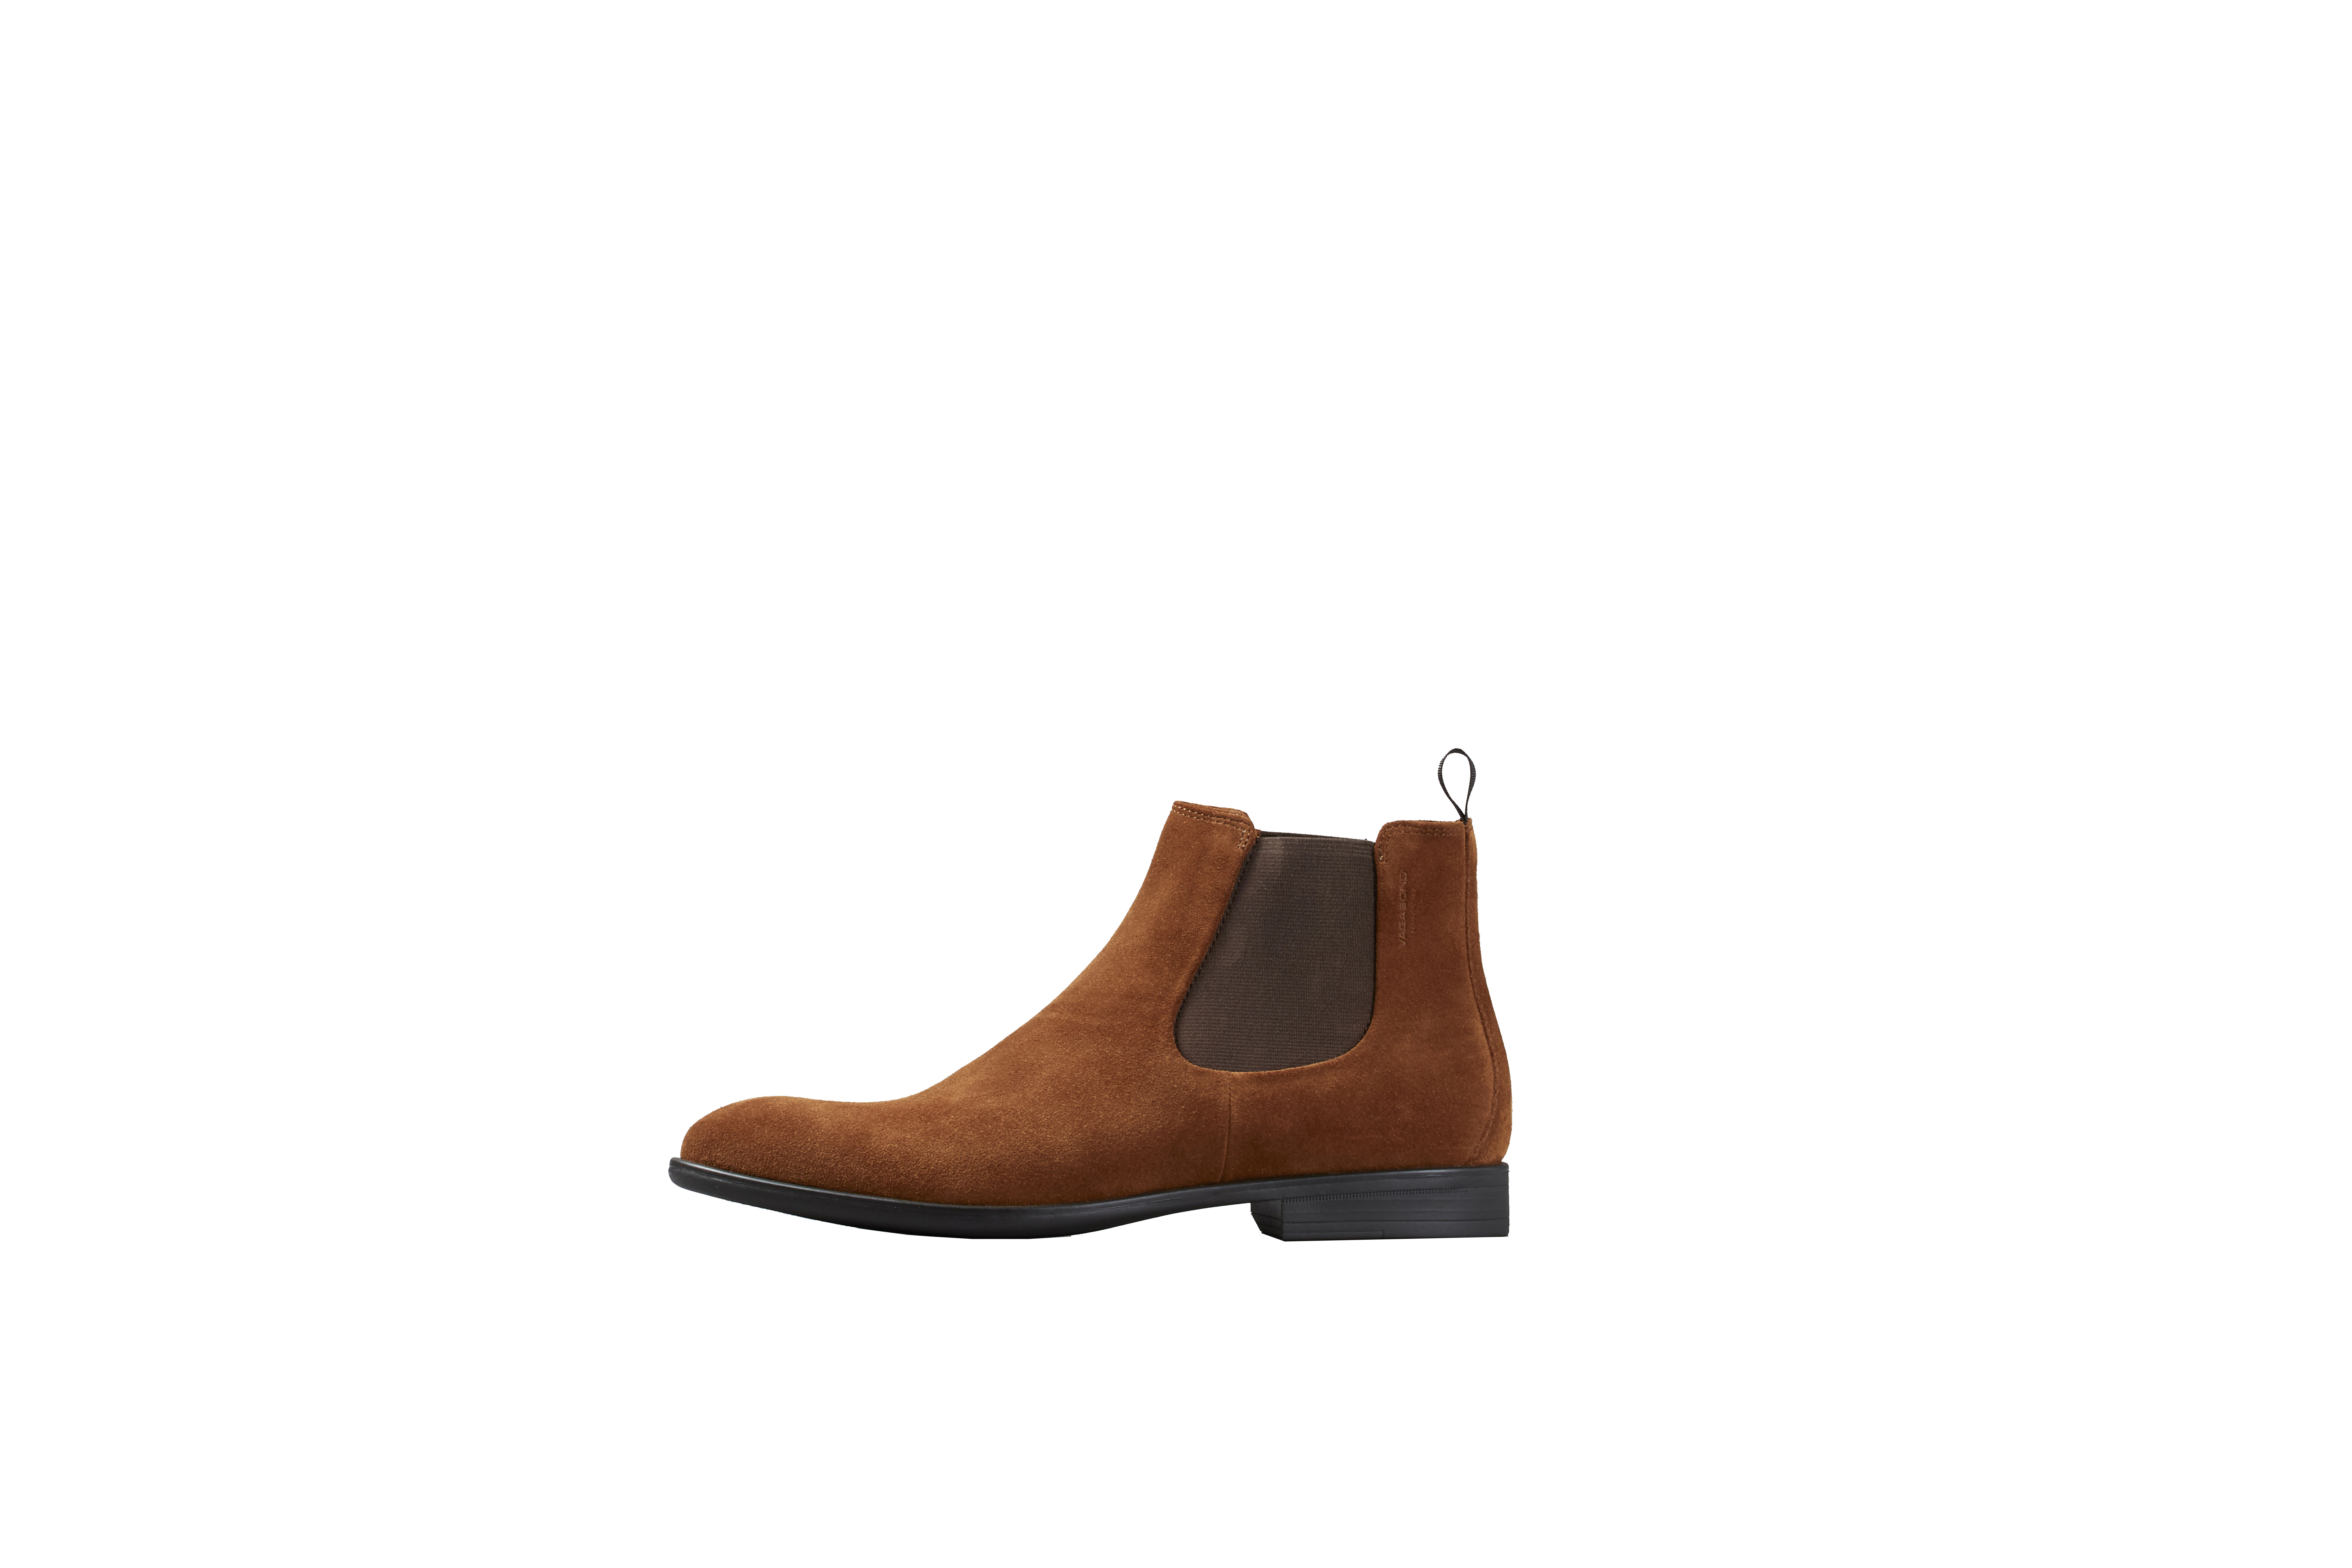 Vagabond Harvey støvle